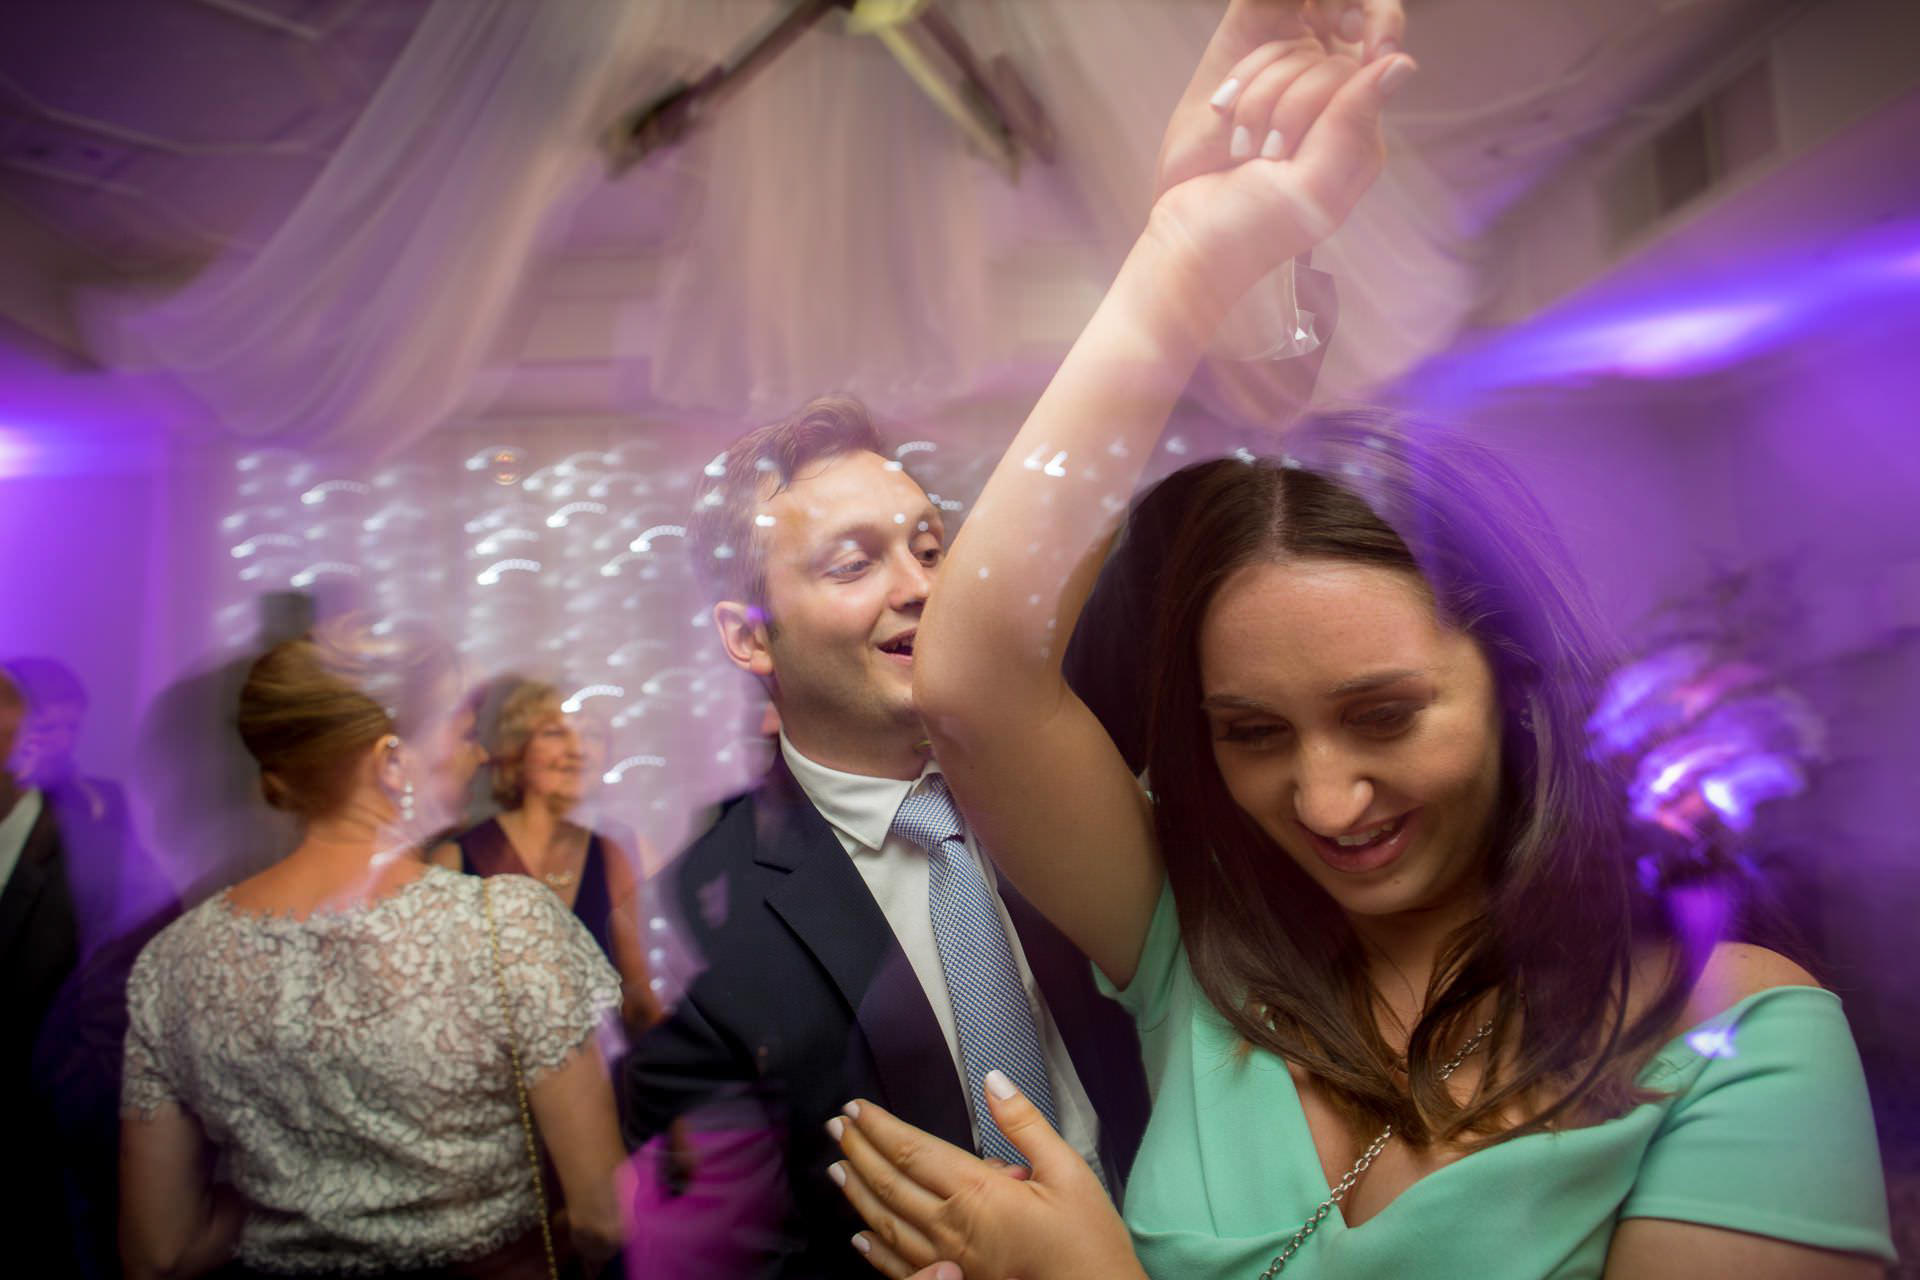 Wotton House wedding party rocks